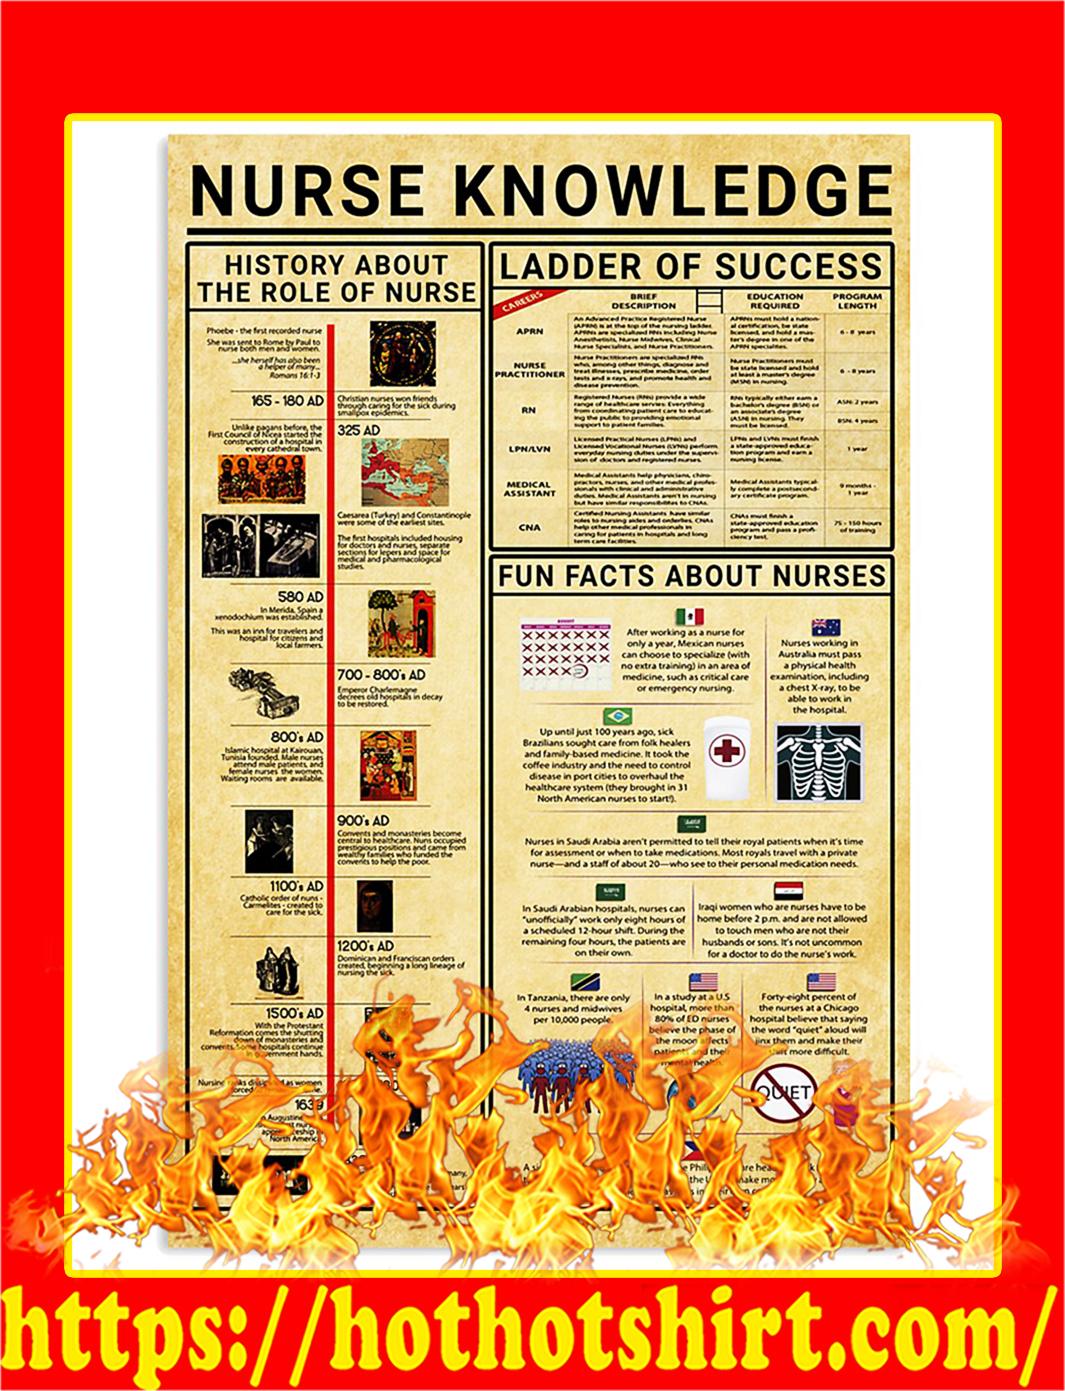 Nurse Knowledge Poster - A1